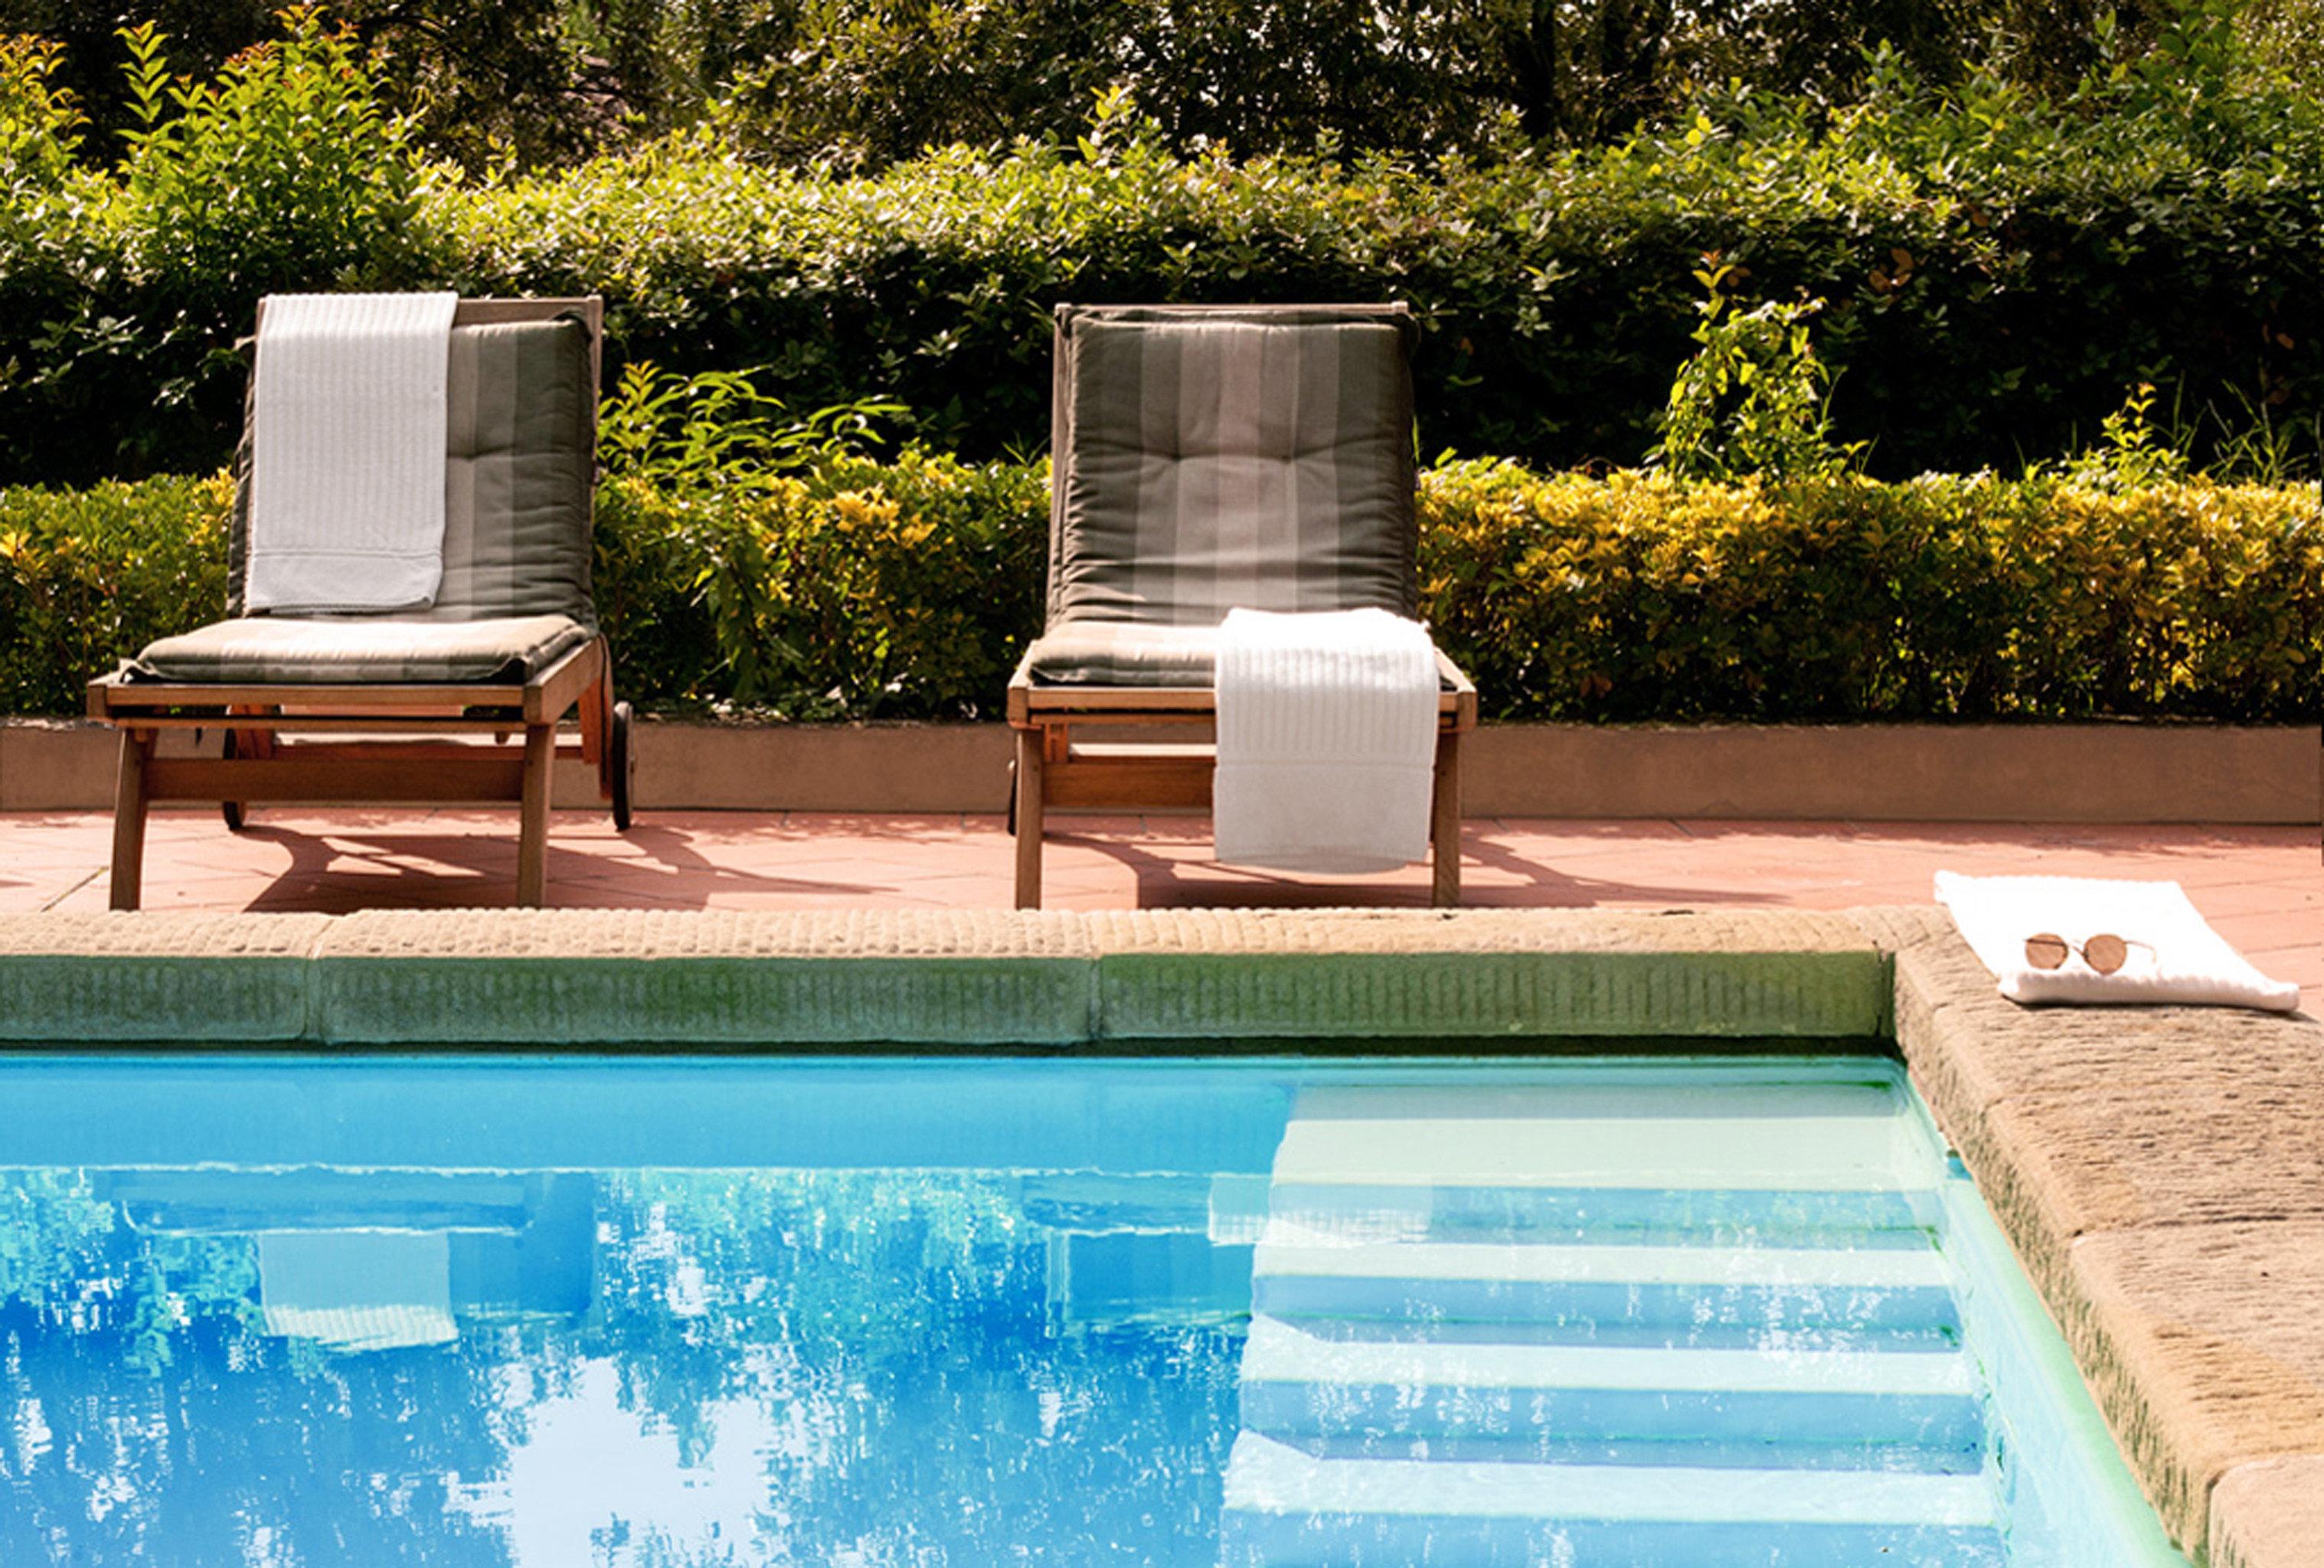 Boutique City Elegant Honeymoon Pool Romance Romantic Villa tree swimming pool leisure backyard reflecting pool outdoor structure